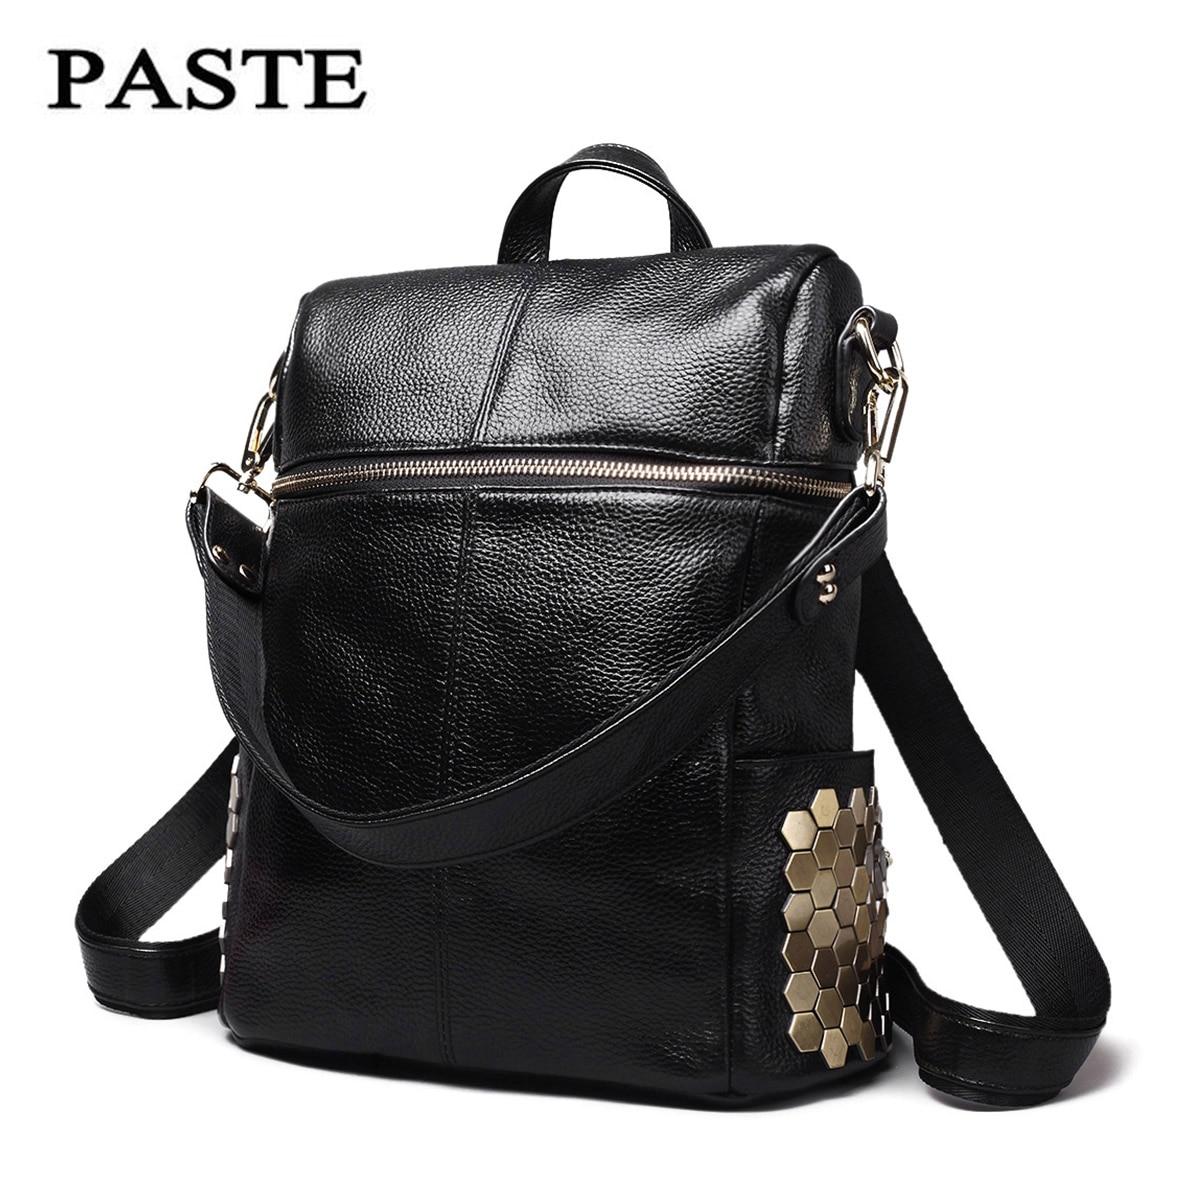 ФОТО PASTE Rock style genuine leather women backpack Fashion Rivet decoration women's travel Shoulder bag Soft Cowskin women Punk bag